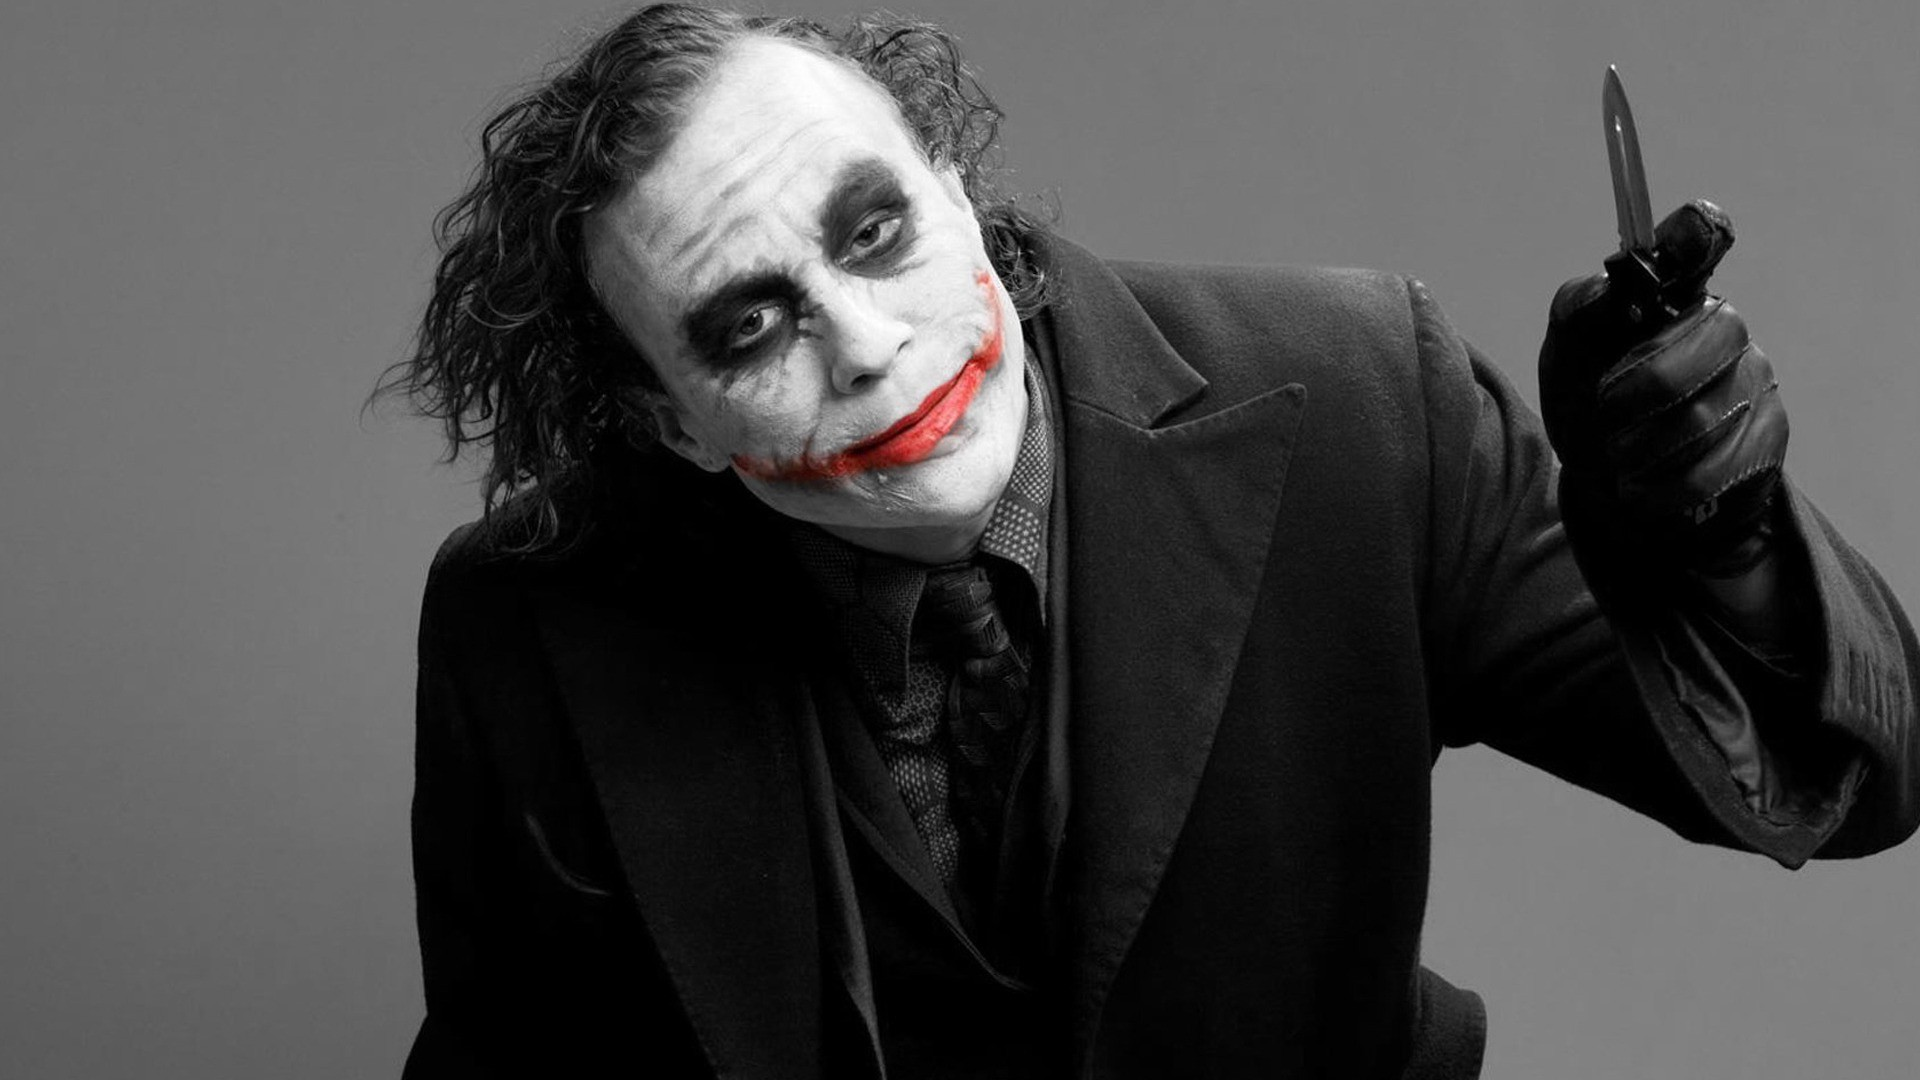 Joker Heath Ledger DC Comics Black And Red Batman 1920x1080